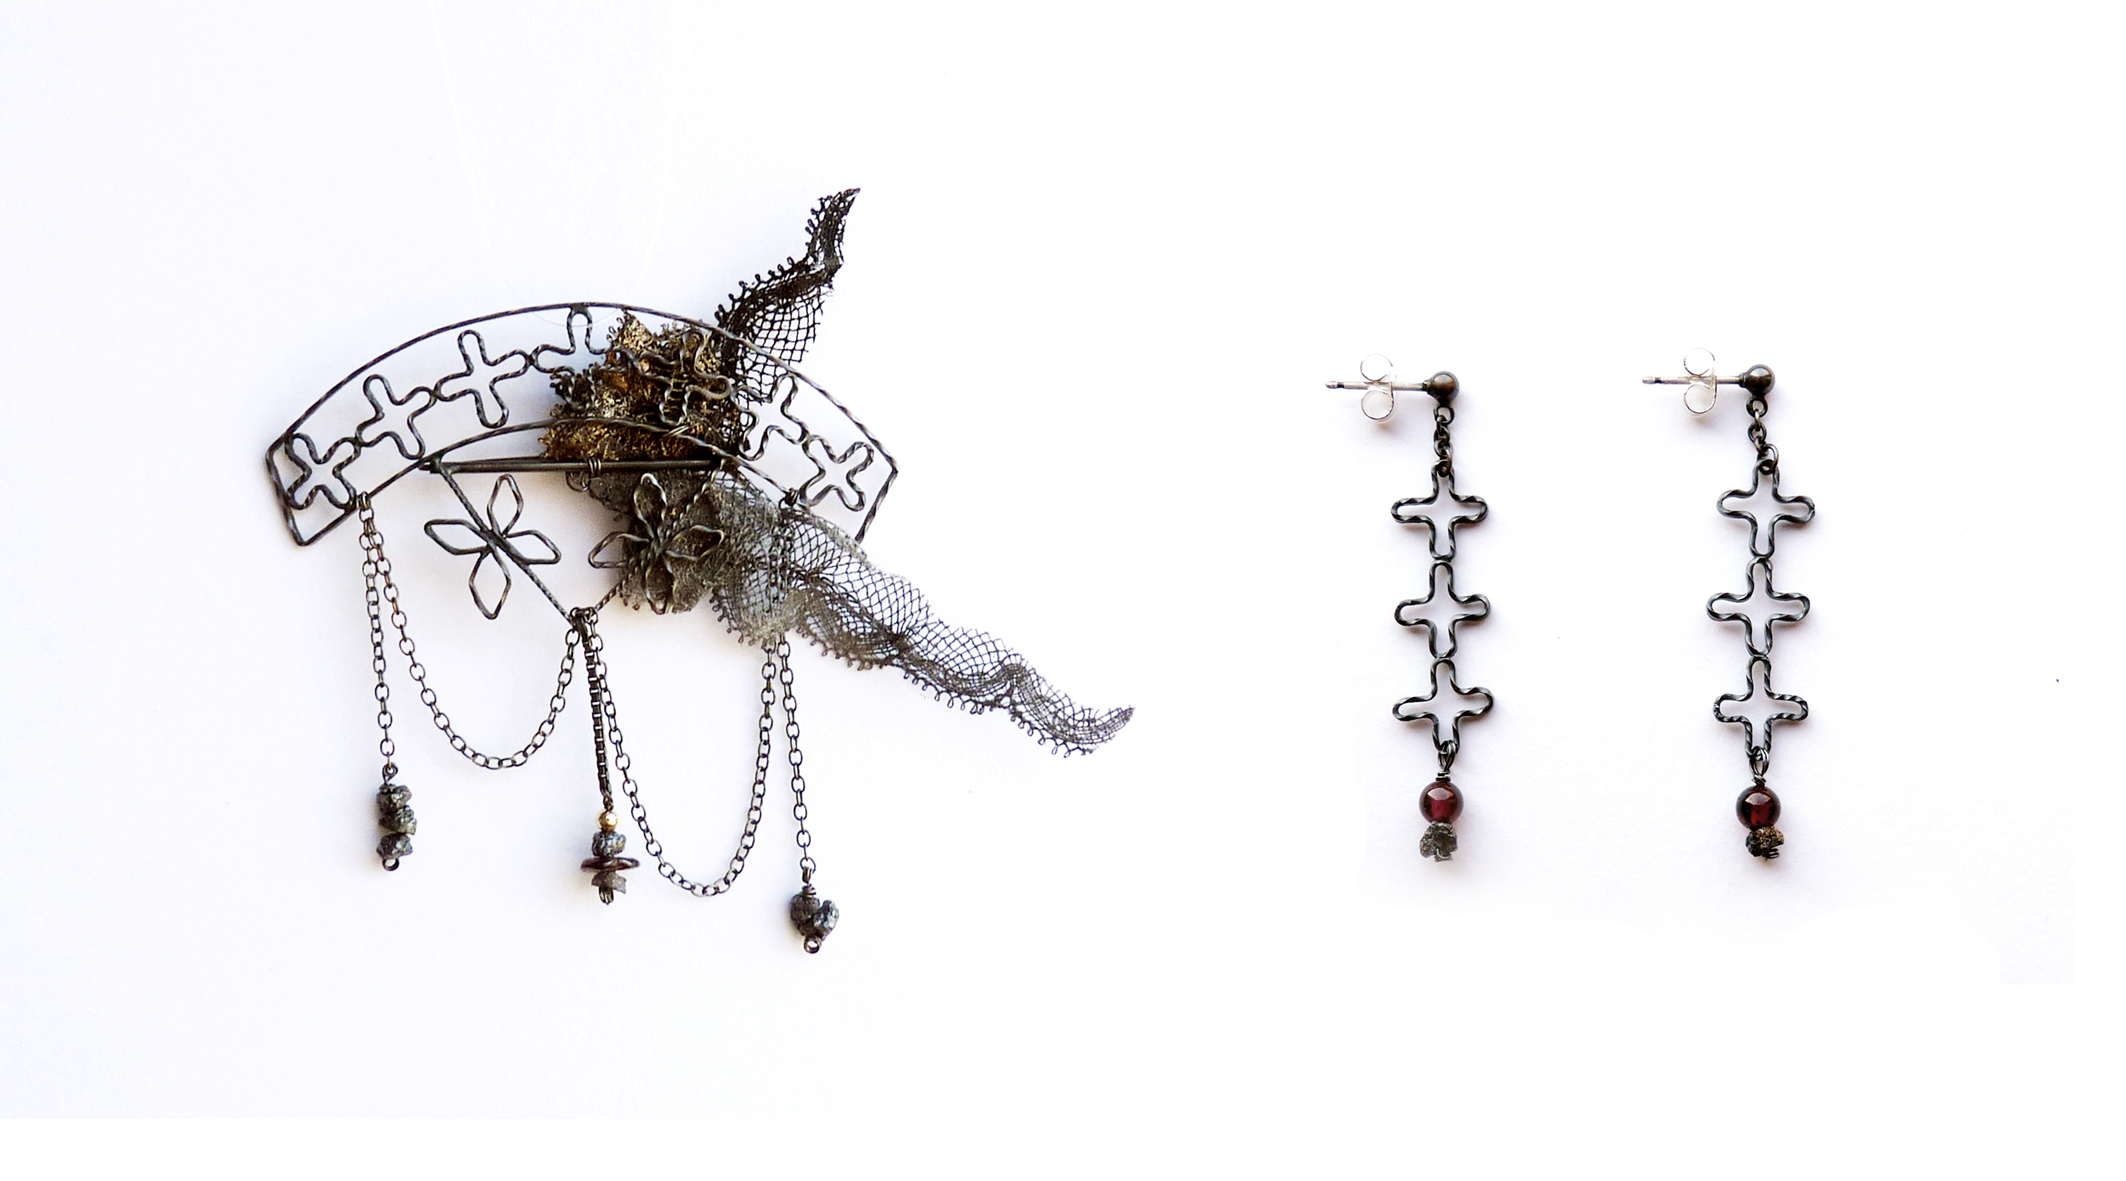 Flower Railings Brooch and Earrings -  oxidised silver, garnet, rough diamonds, vintage lace. 2012